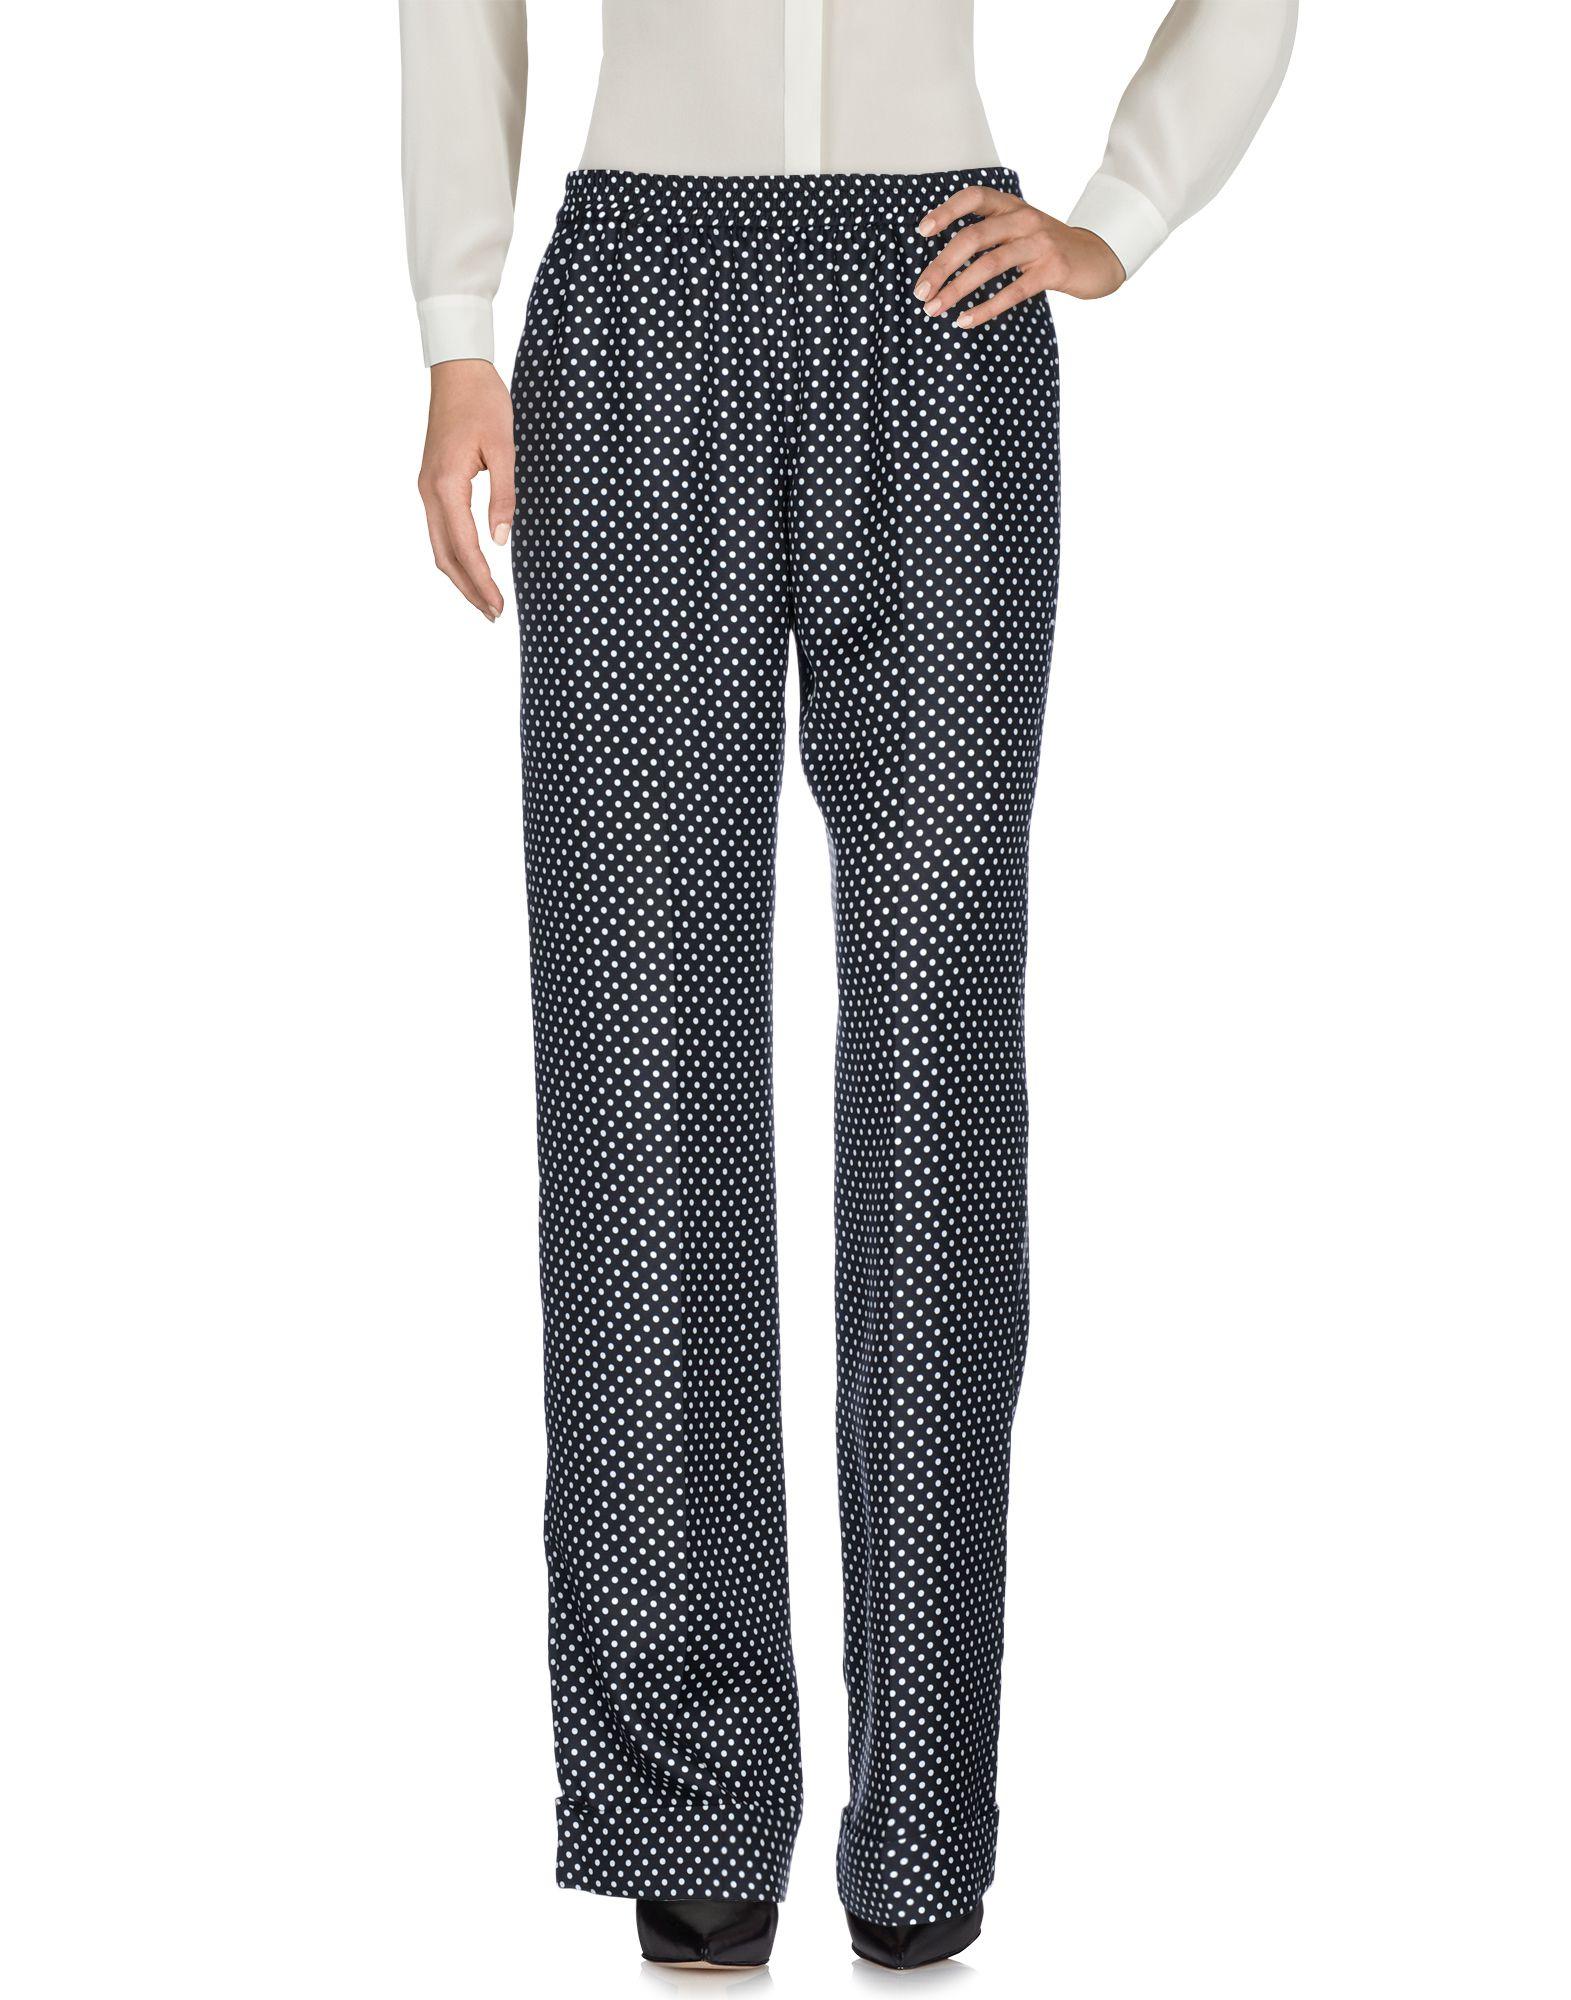 Pantalone Michael Kors Collection Donna - Acquista online su 7rvhgr